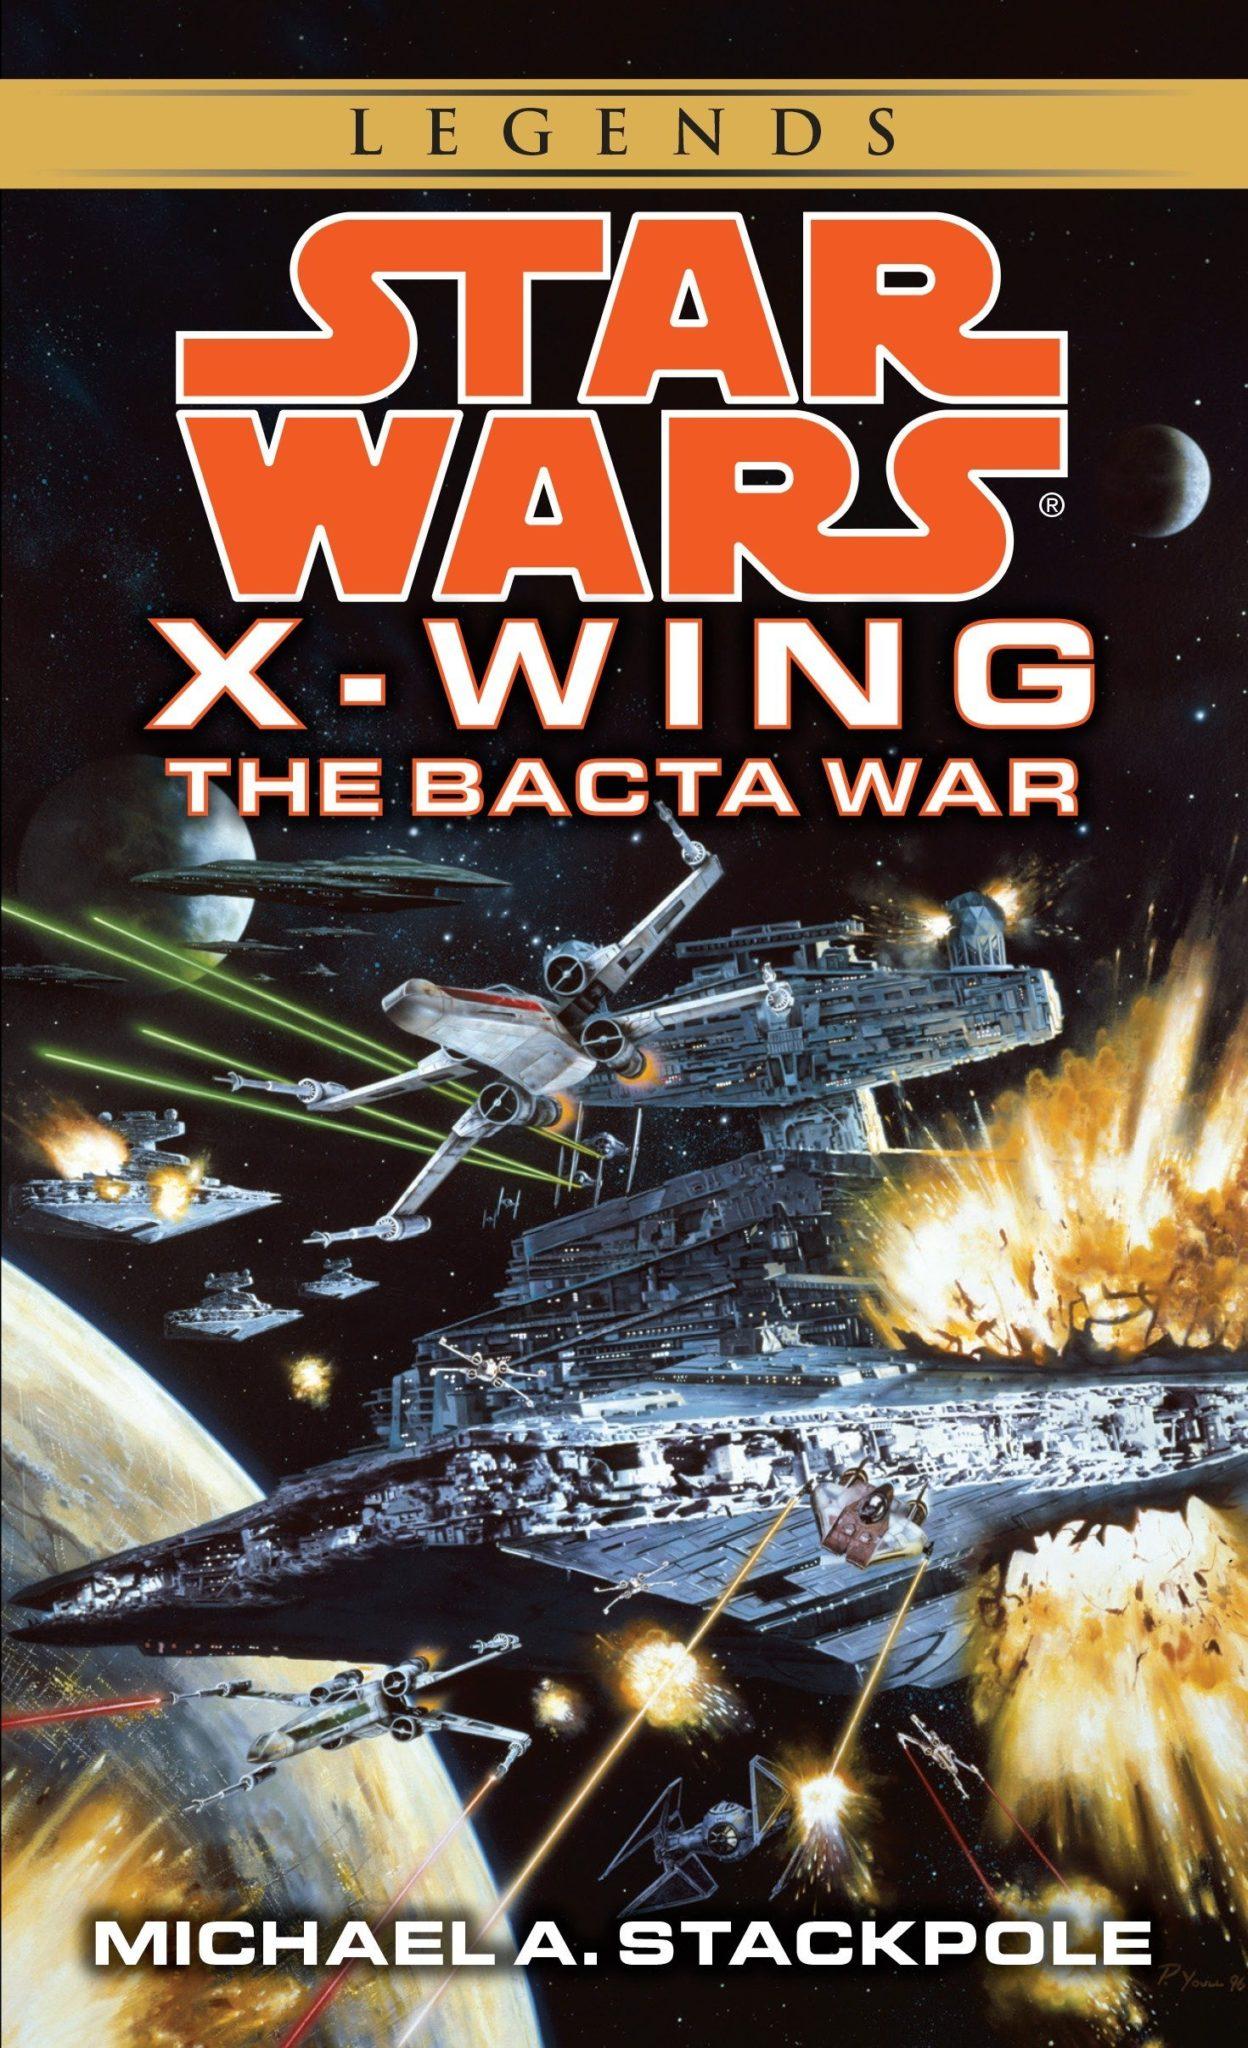 Star Wars books 12